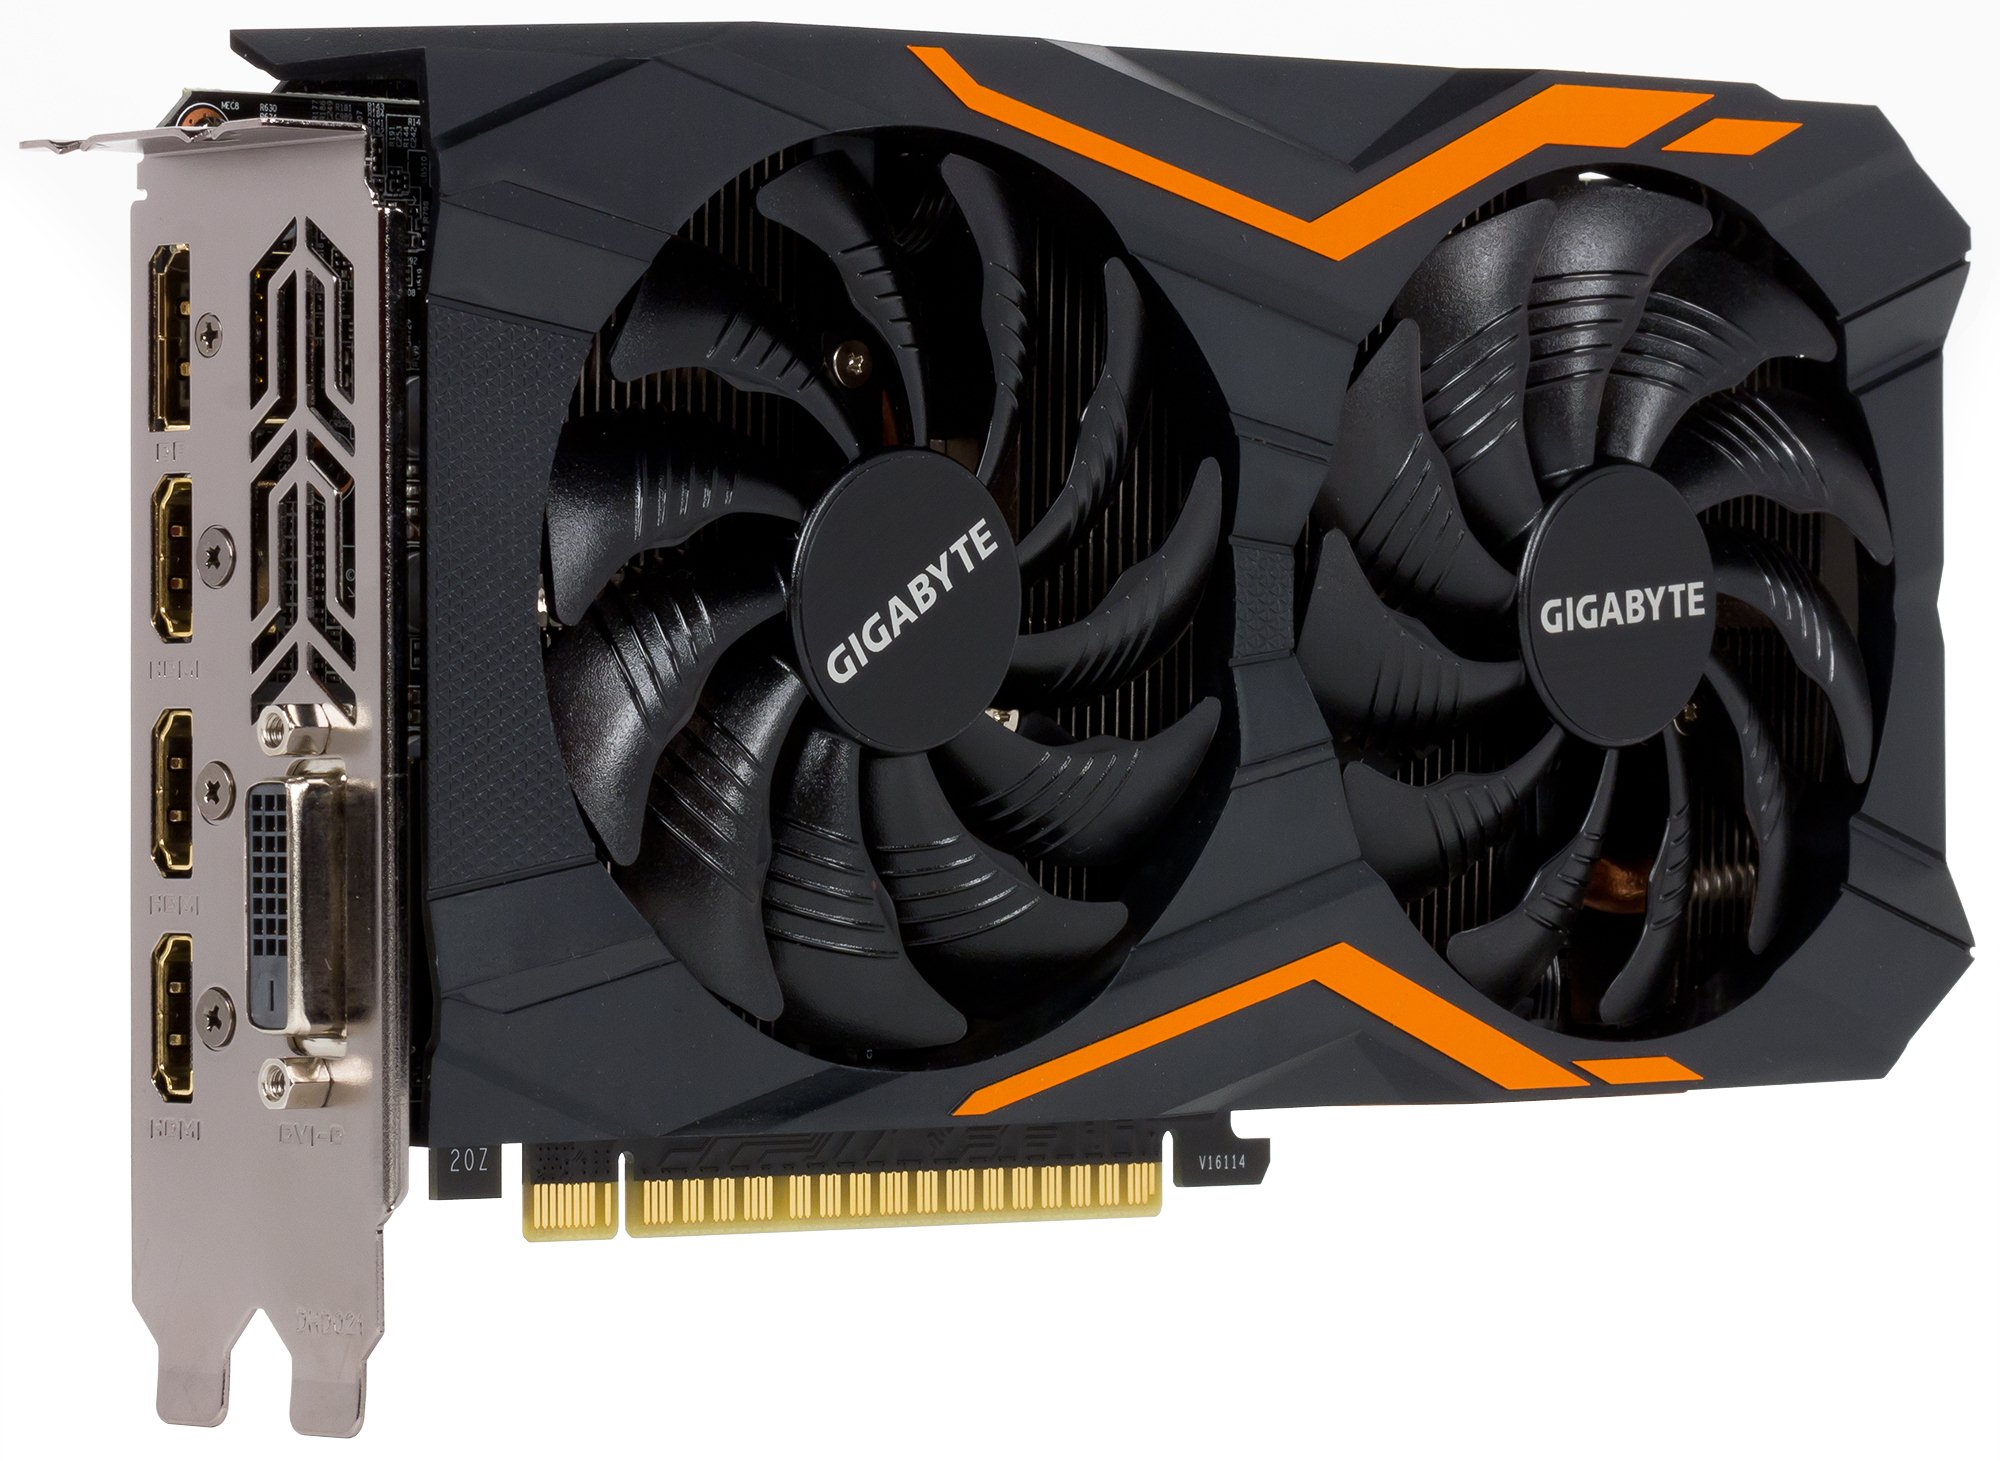 Nvidia GeForce GTX 1050 Ti 4 ГБ 128-битной GDDR5 (1290-1482/7000 МГц)